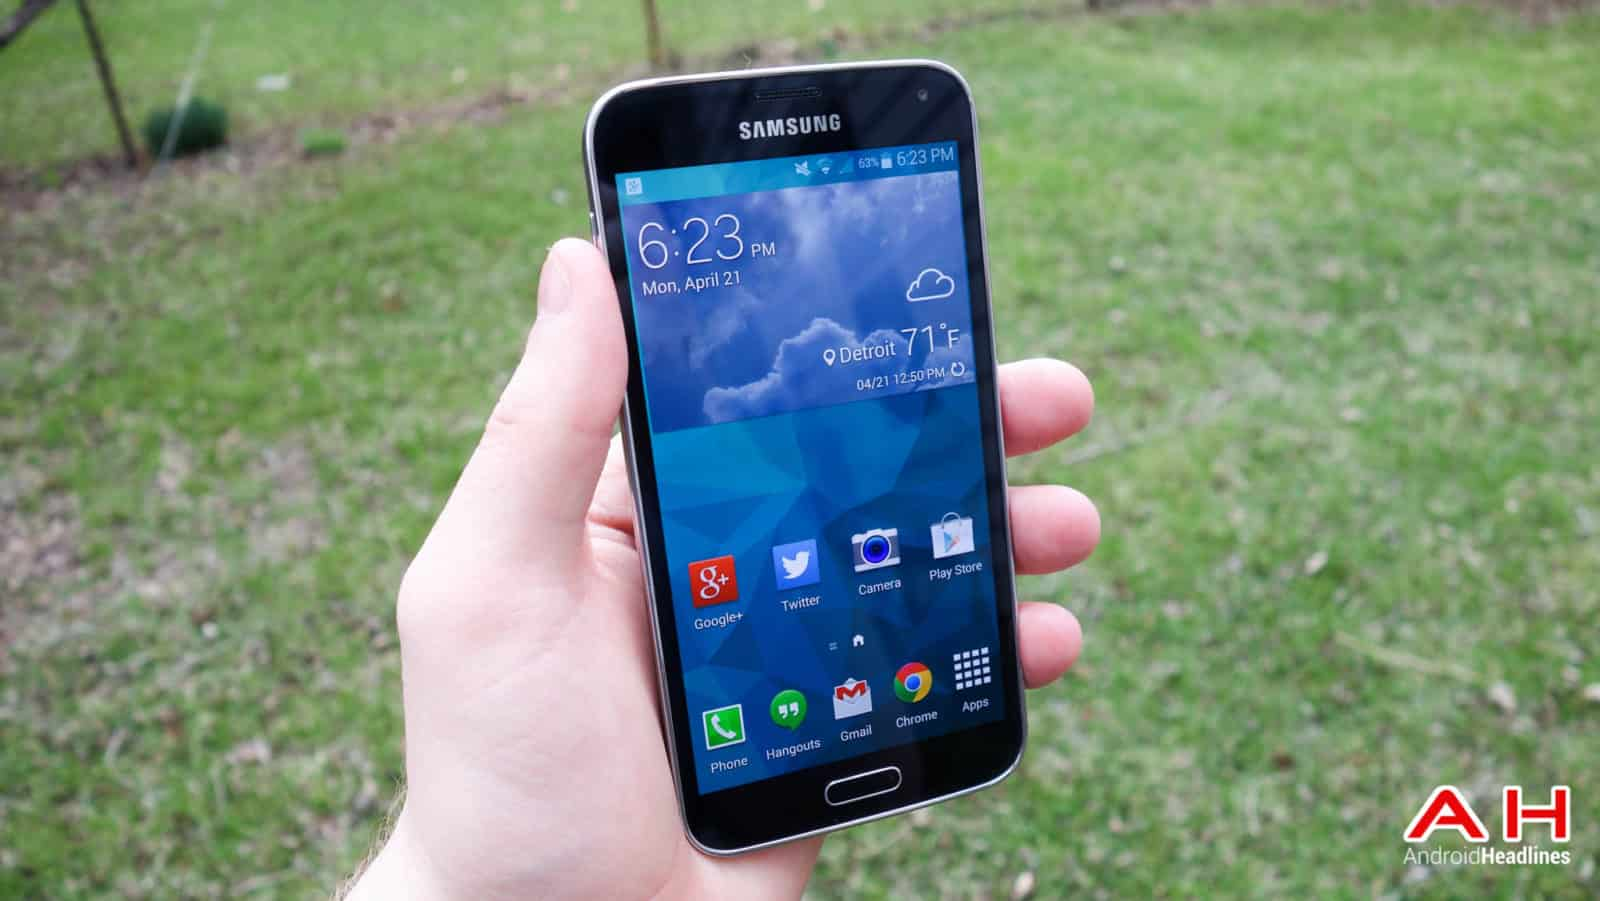 Samsung-galaxy-s5-ah-20